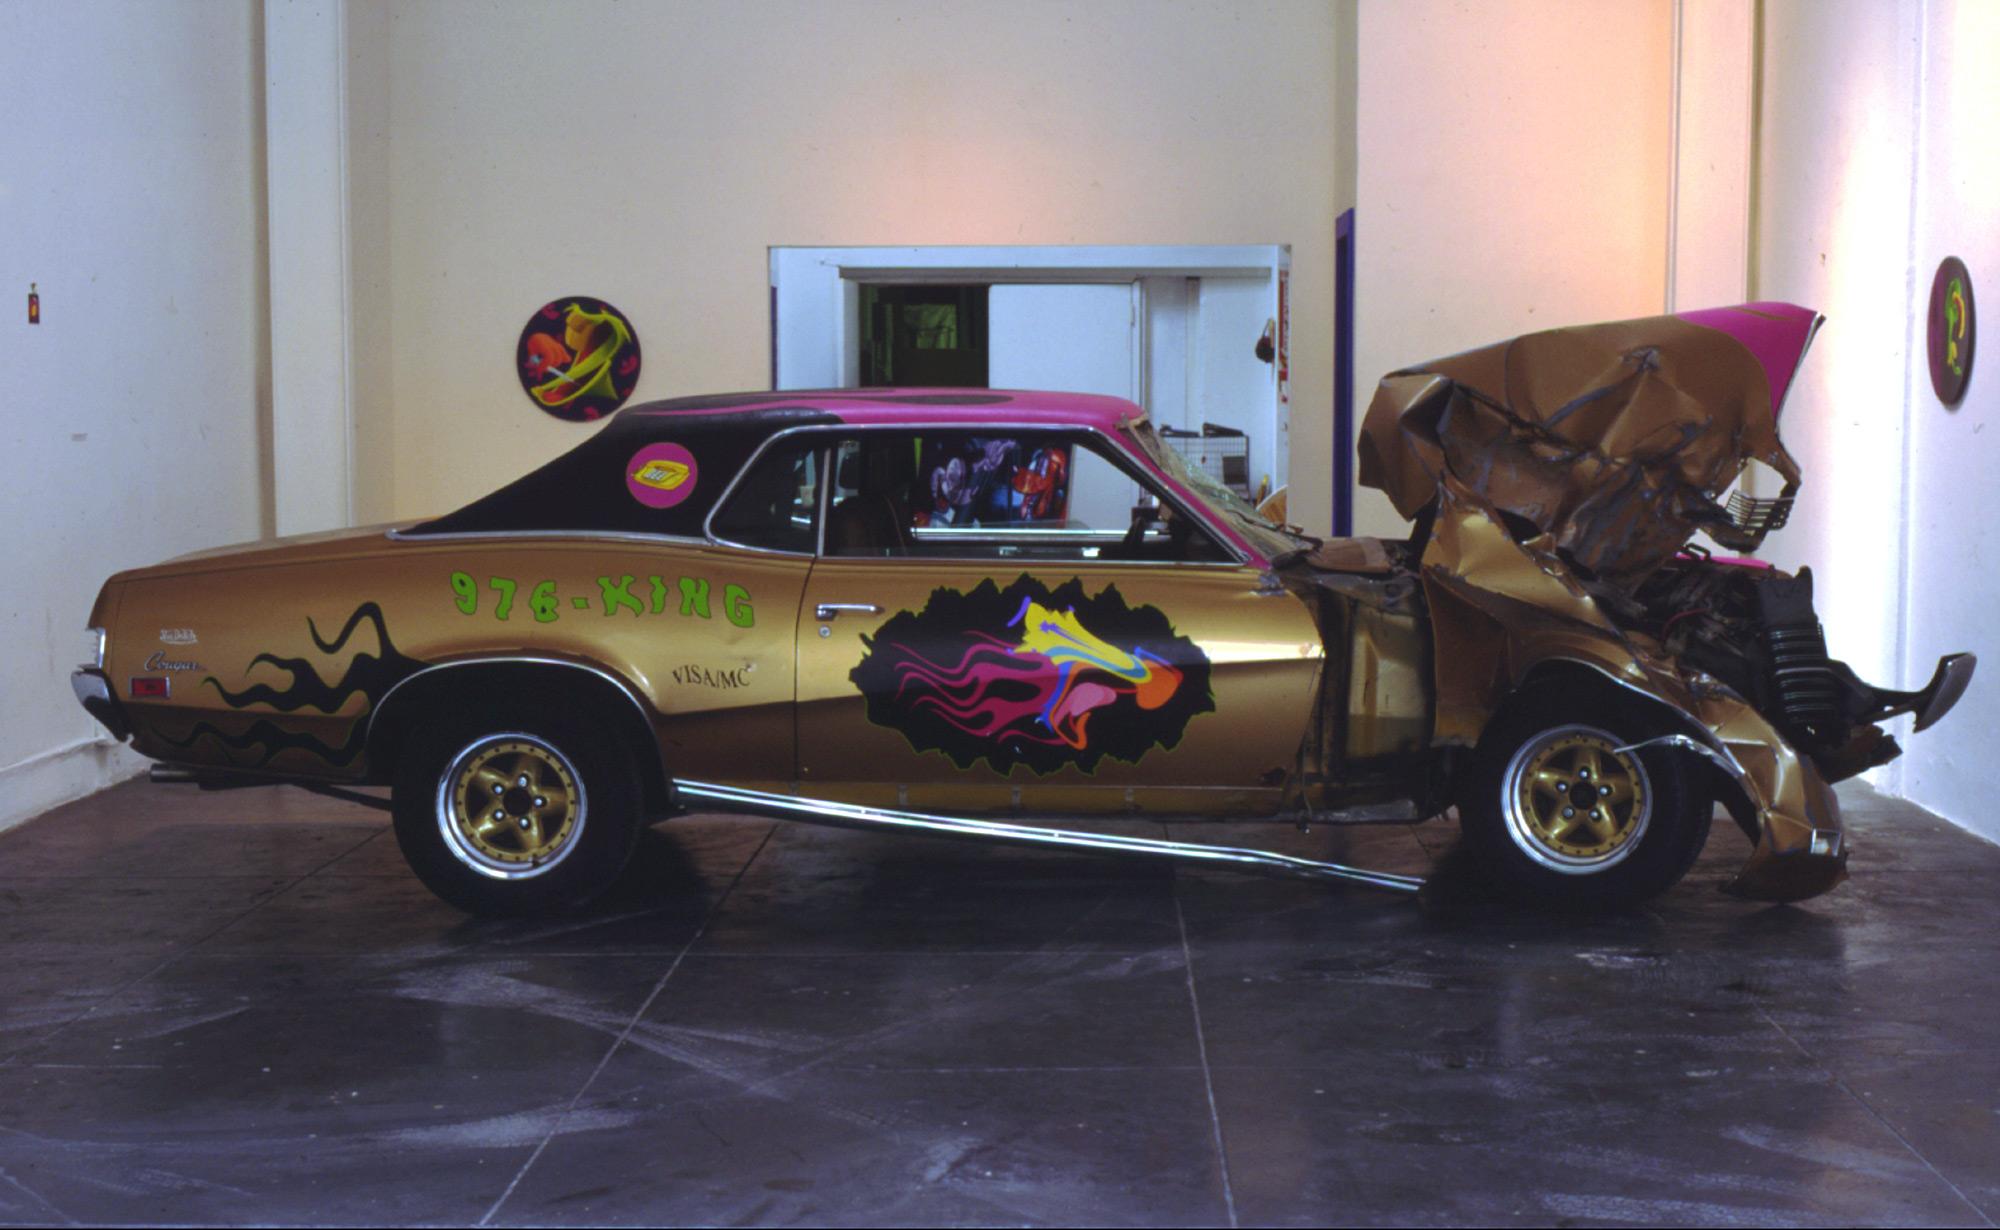 Carphone Sex: Installation, 1996